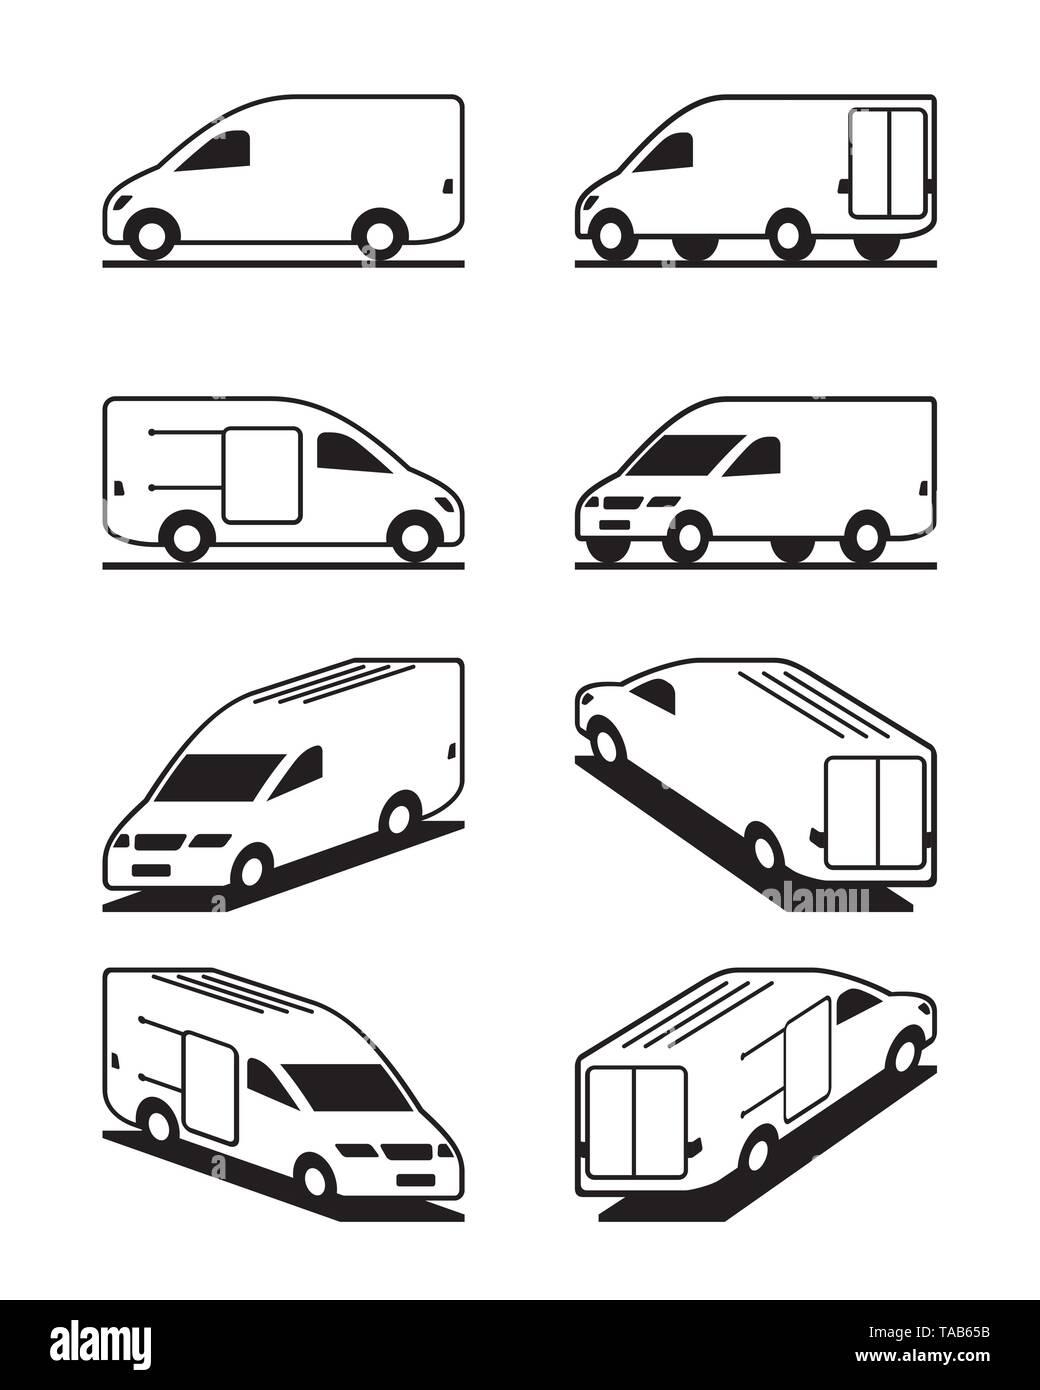 Van in different perspective - vector illustration - Stock Image